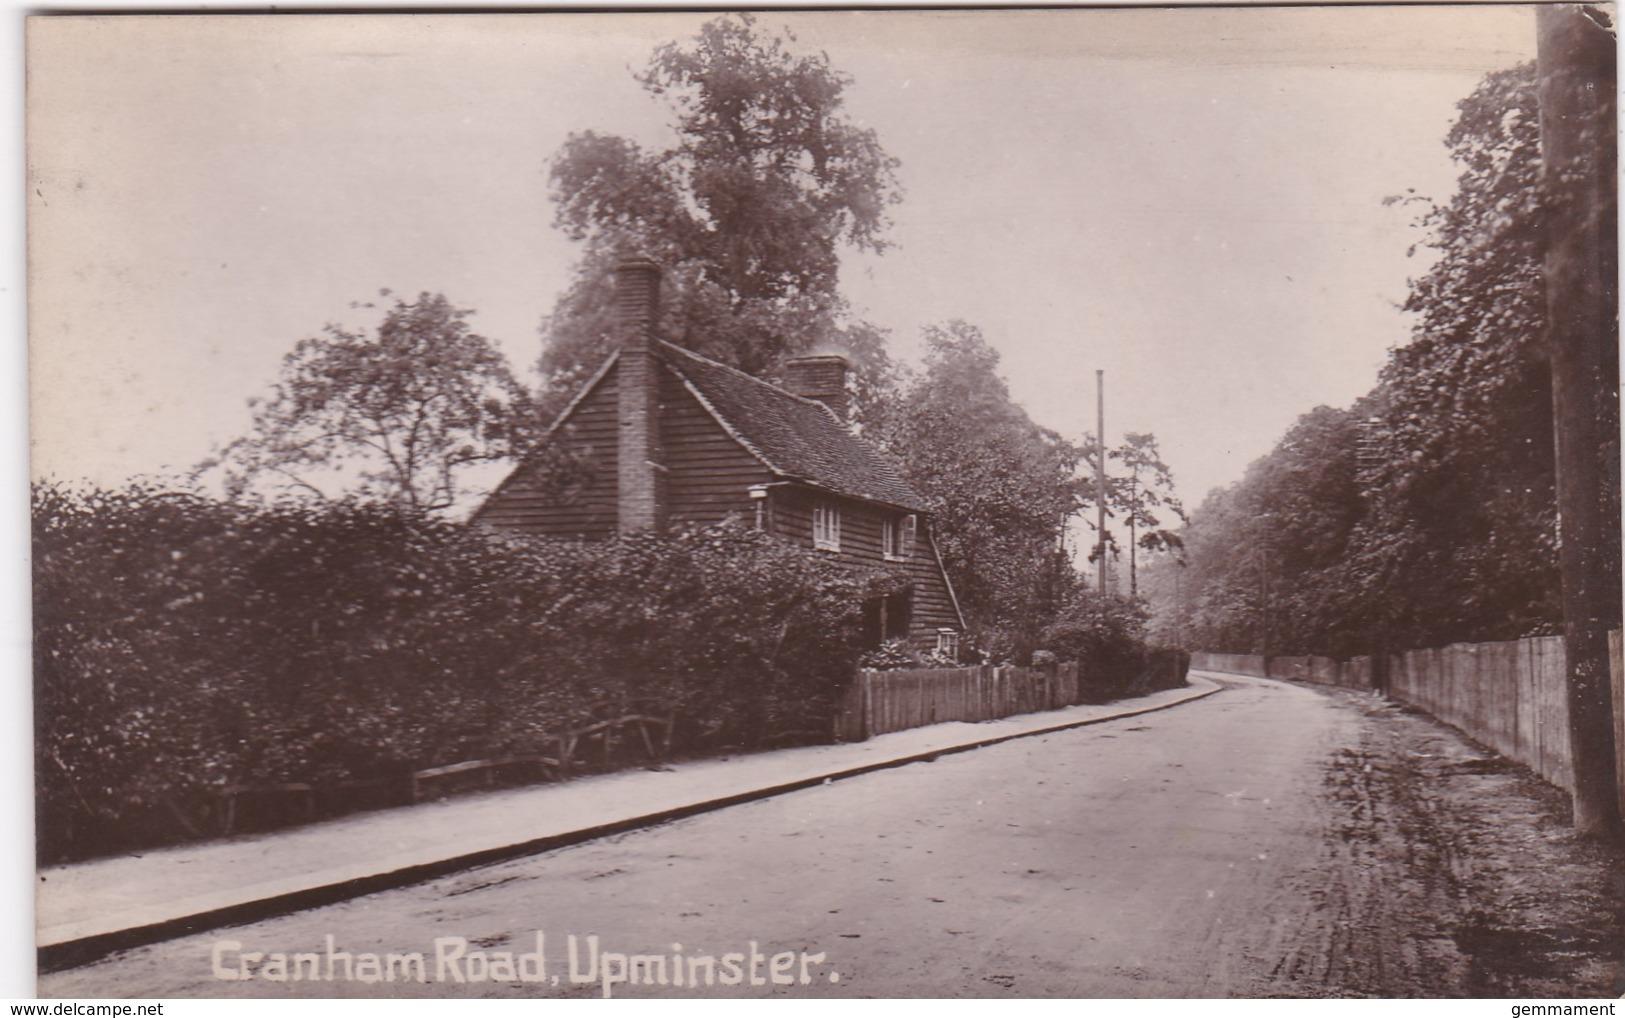 UPMINSTER - CRANHAM ROAD - London Suburbs